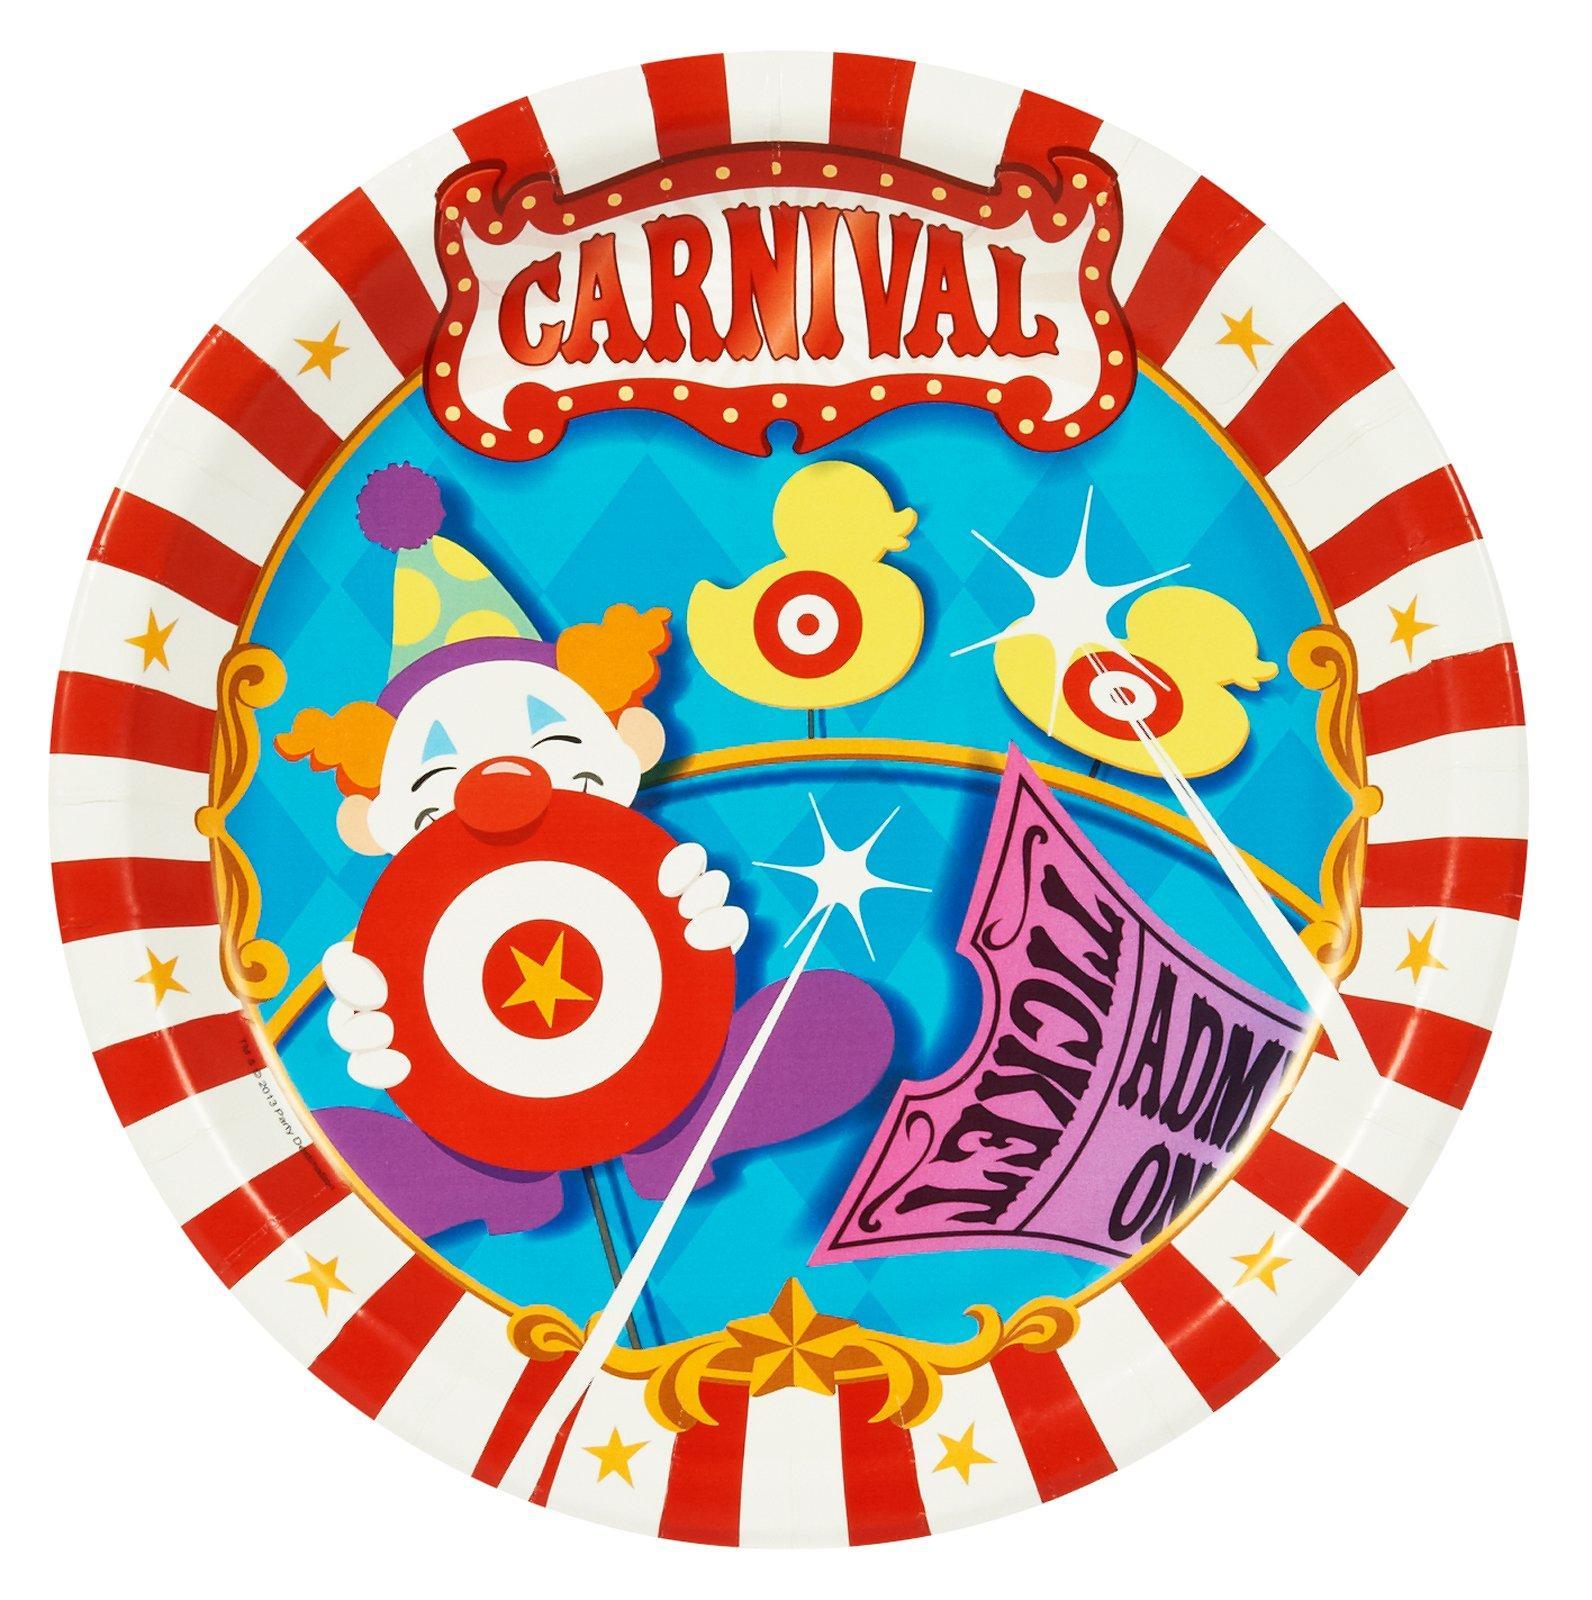 Carneval clipart logo Game dinner carnival Pictures Carnival